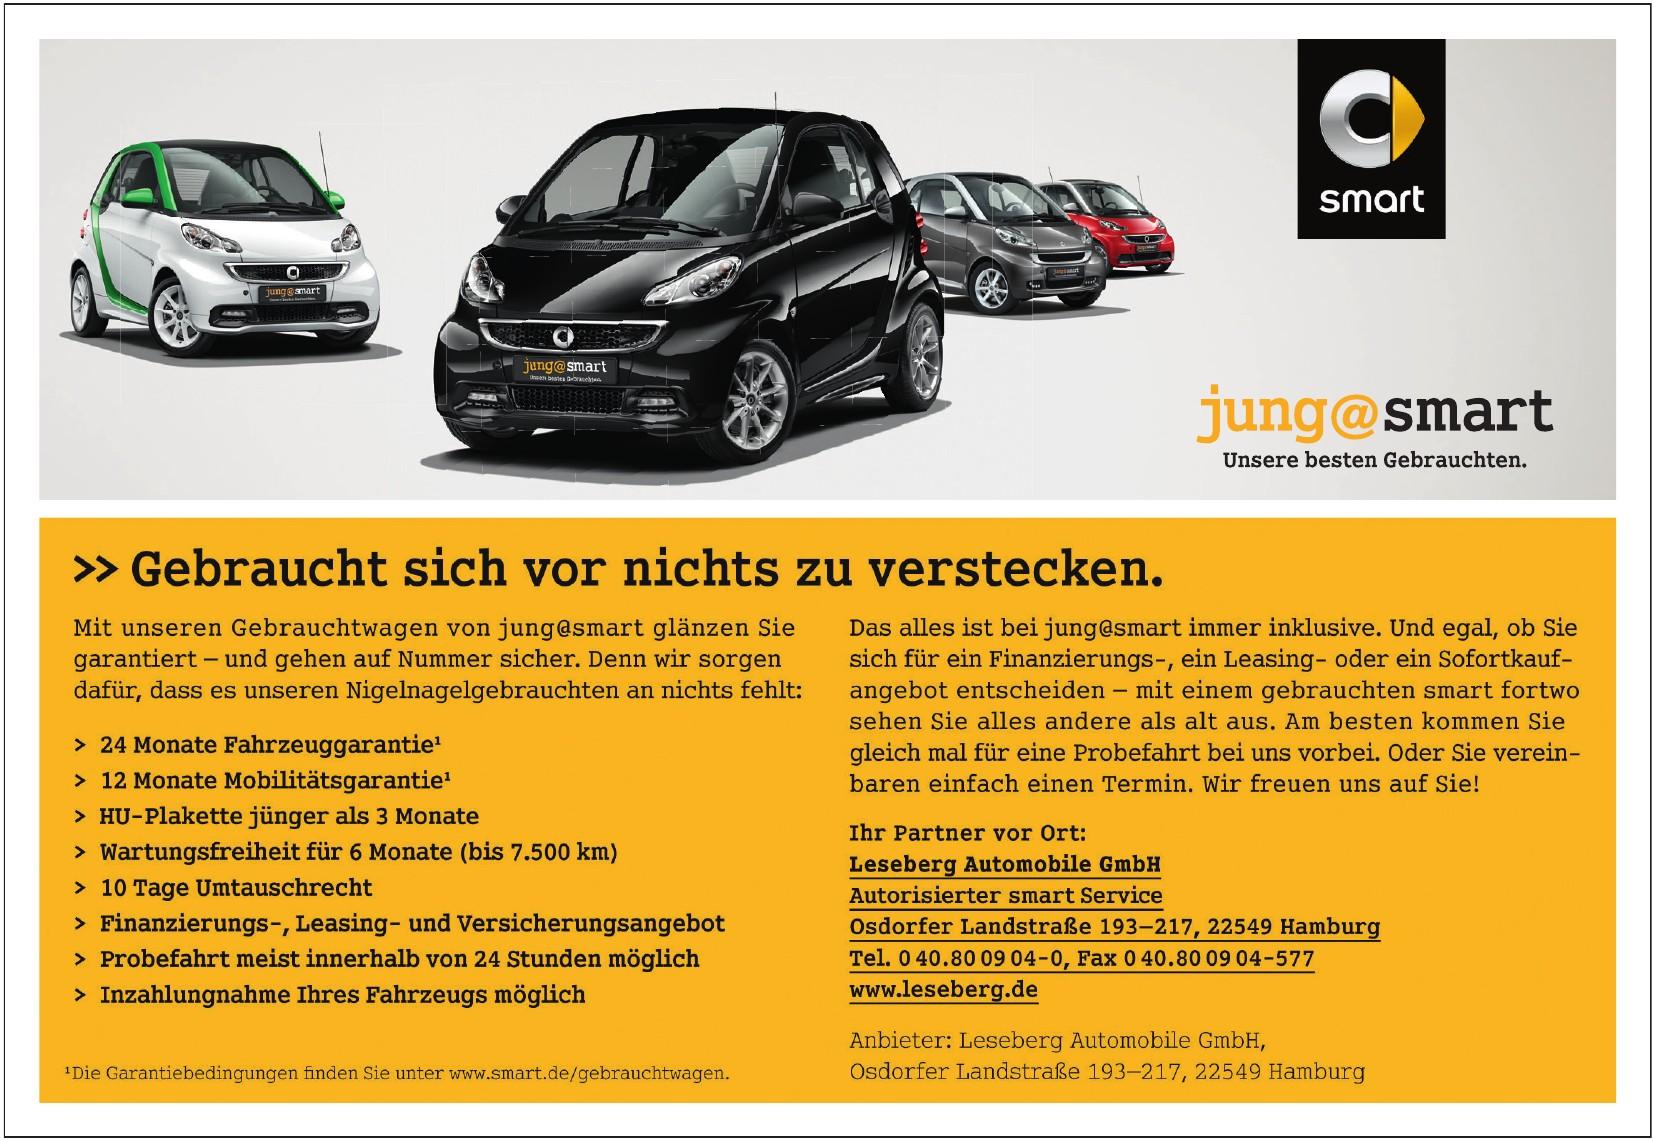 Leseberg Automobile GmbH